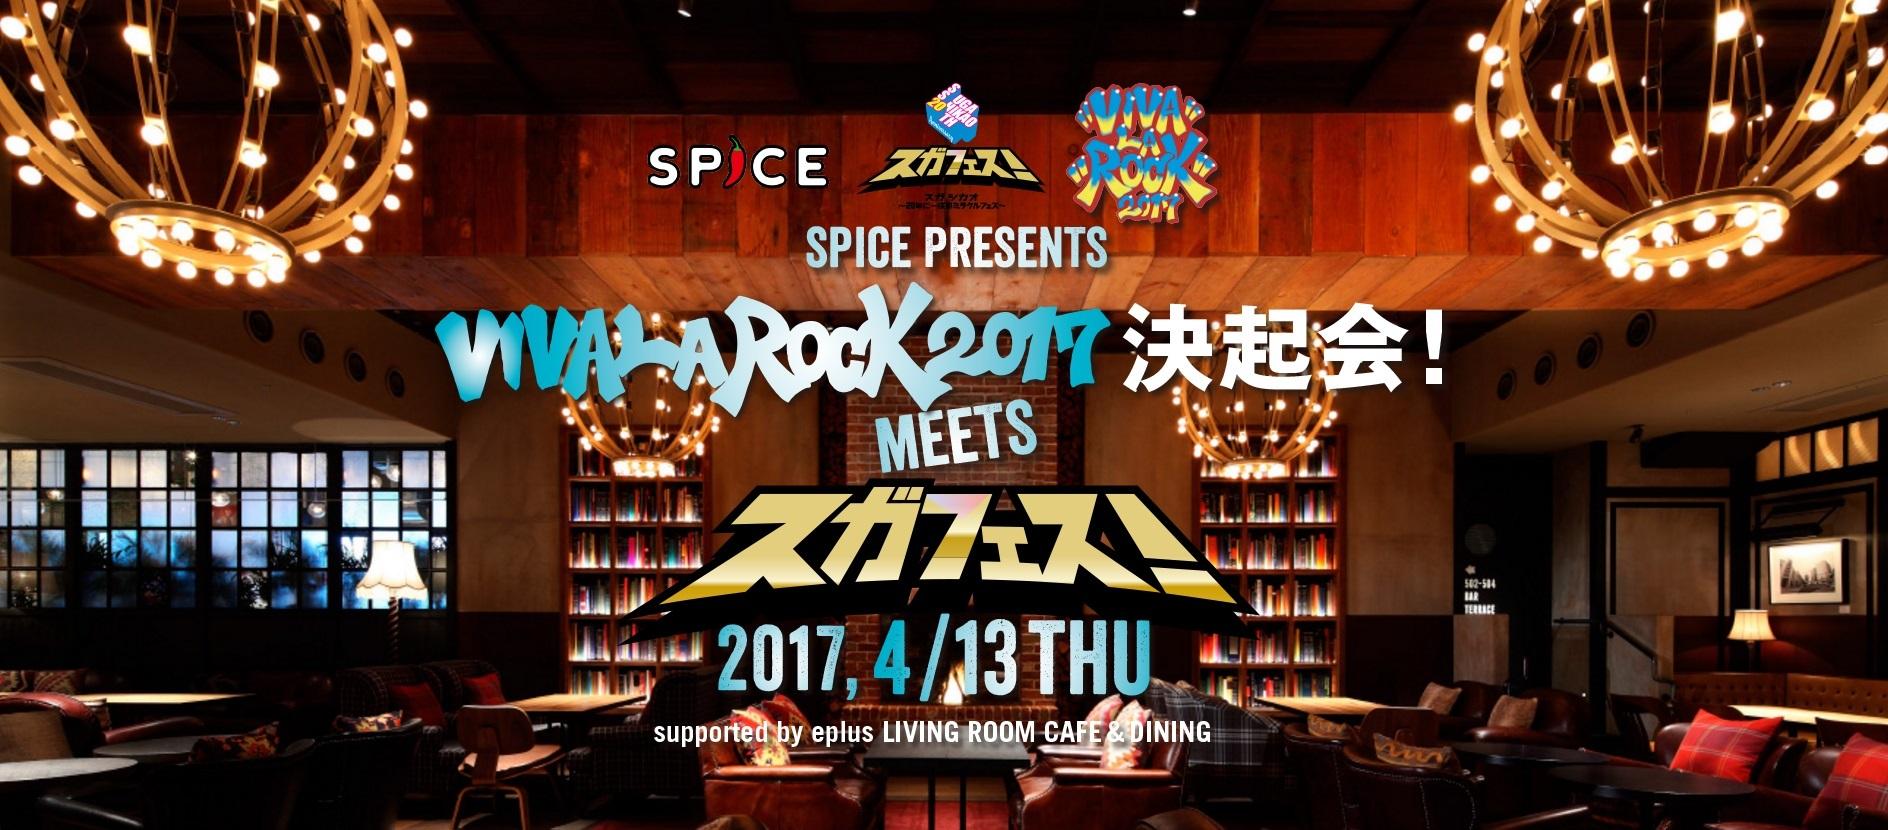 『SPICE presents「VIVA LA ROCK 2017 & スガフェス!決起会!」』